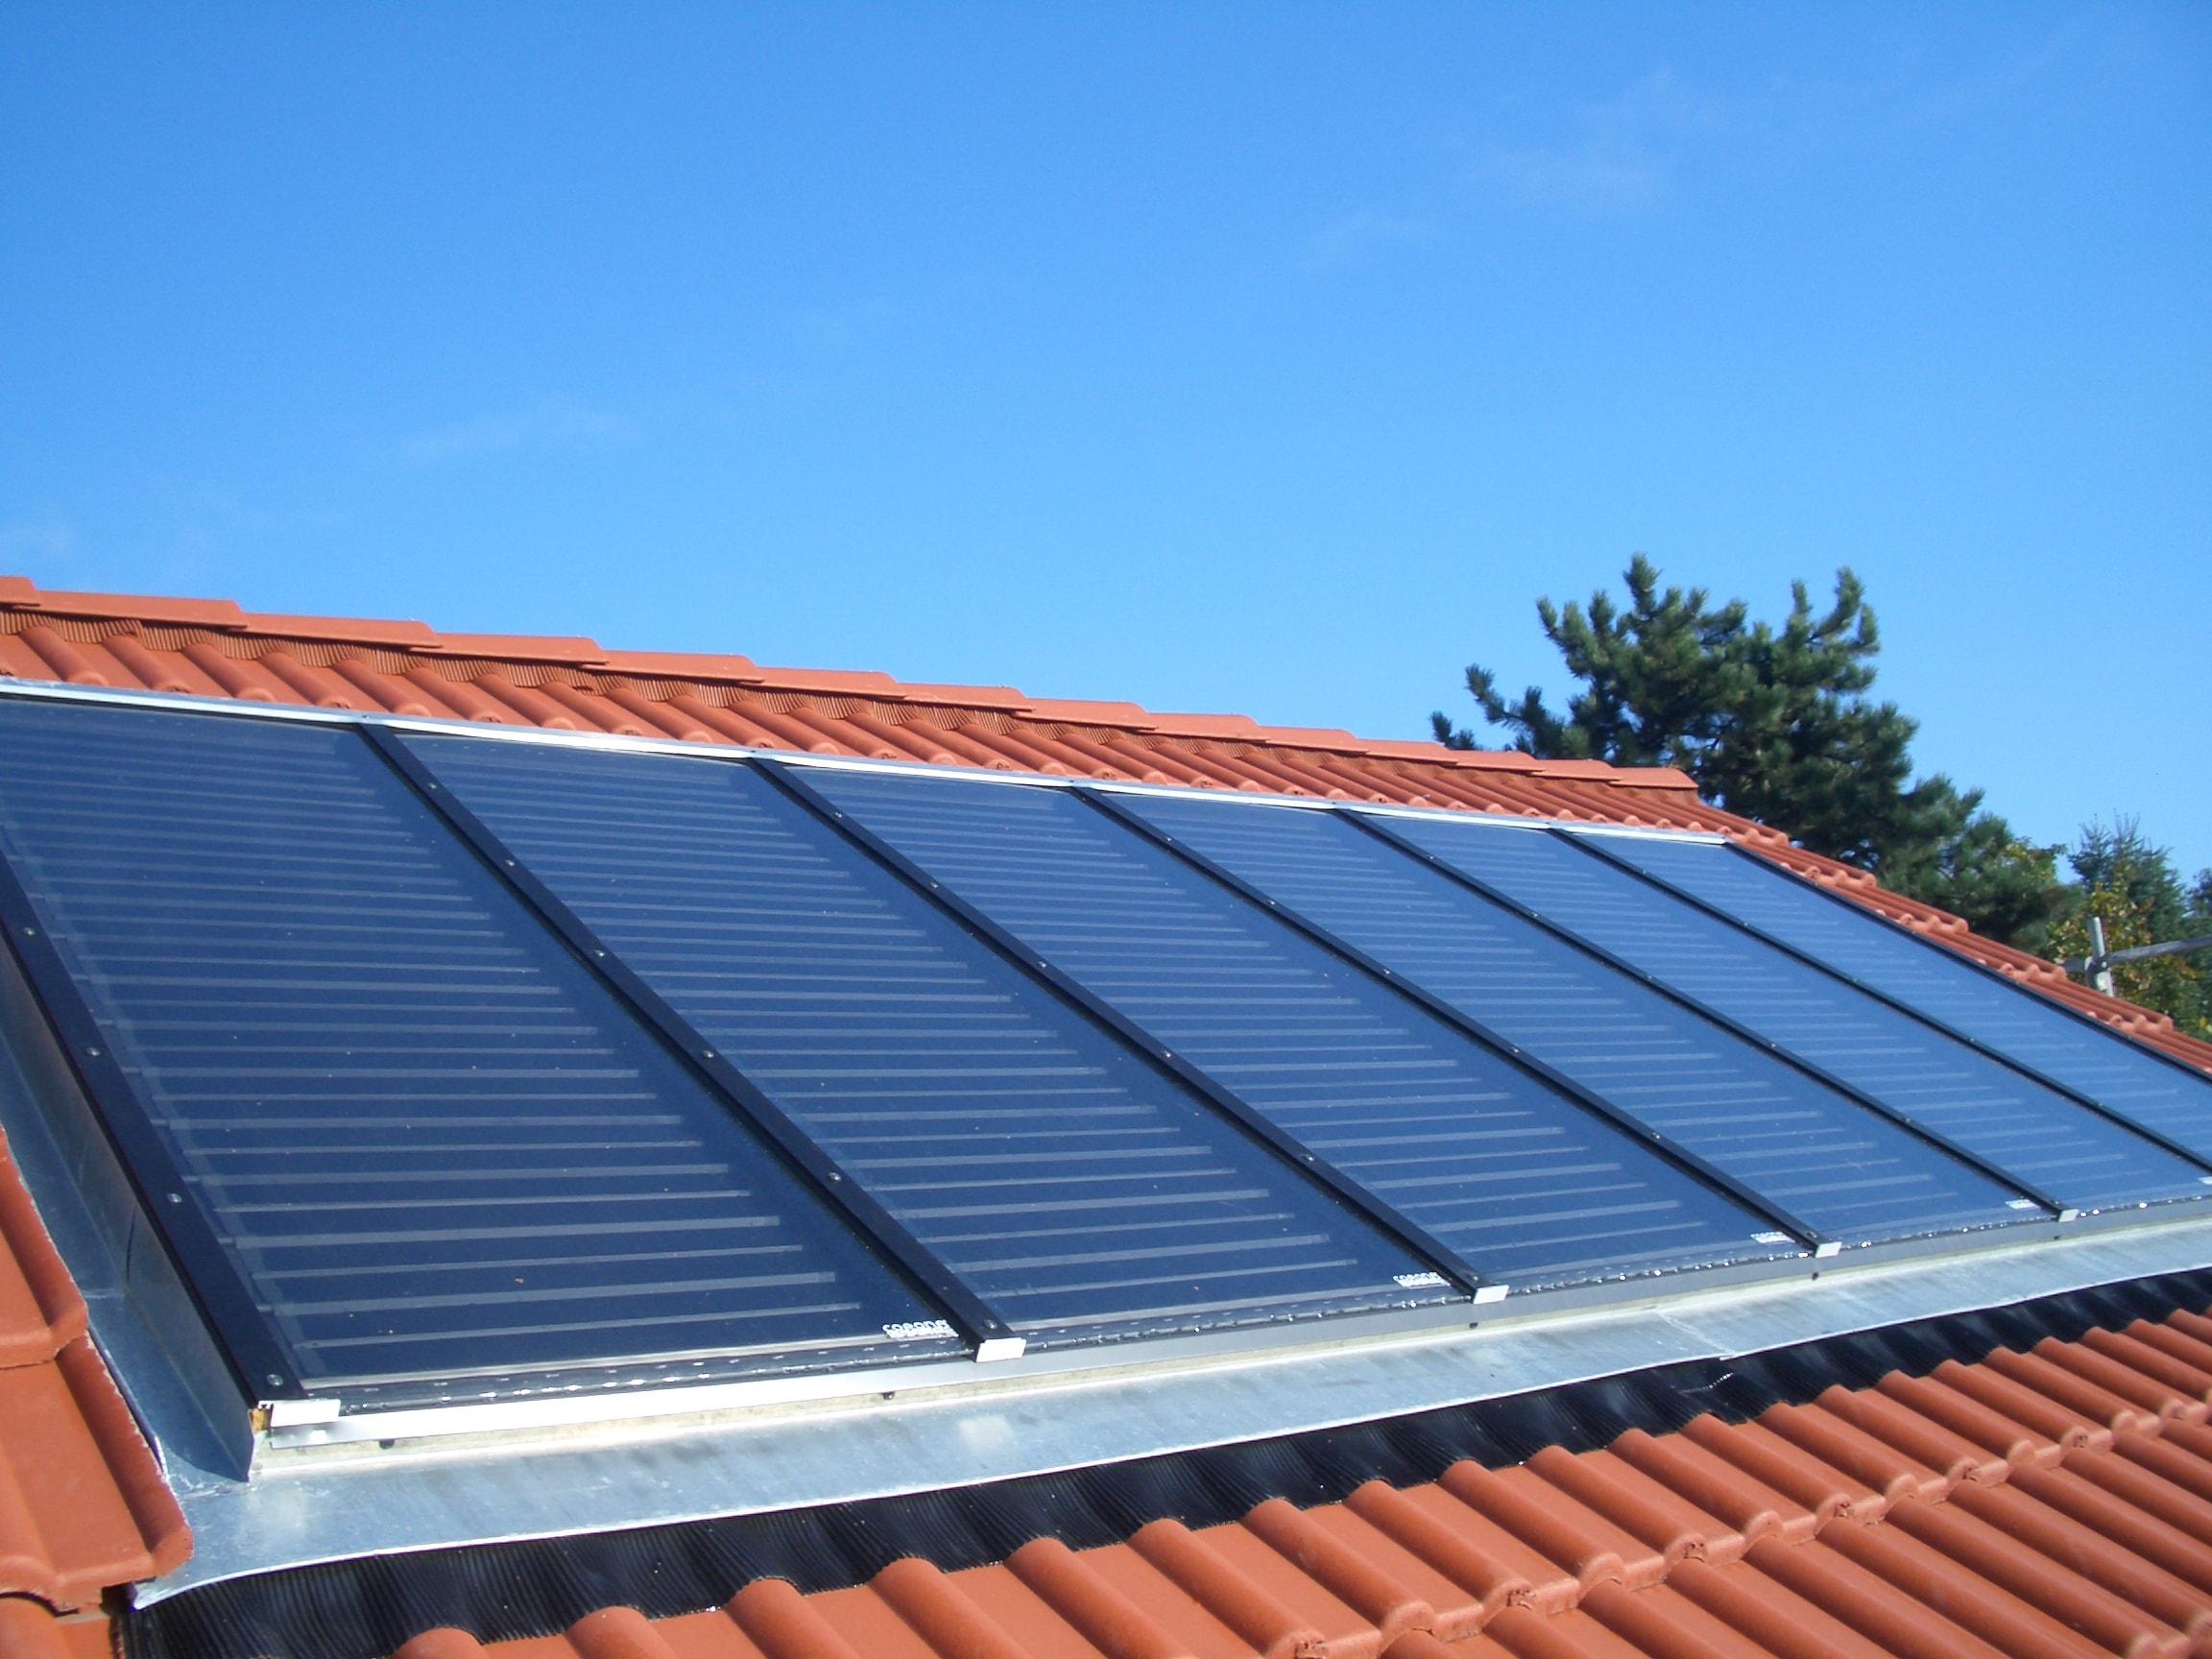 Solartechnik von Dachtechnik Winkel in Bochum